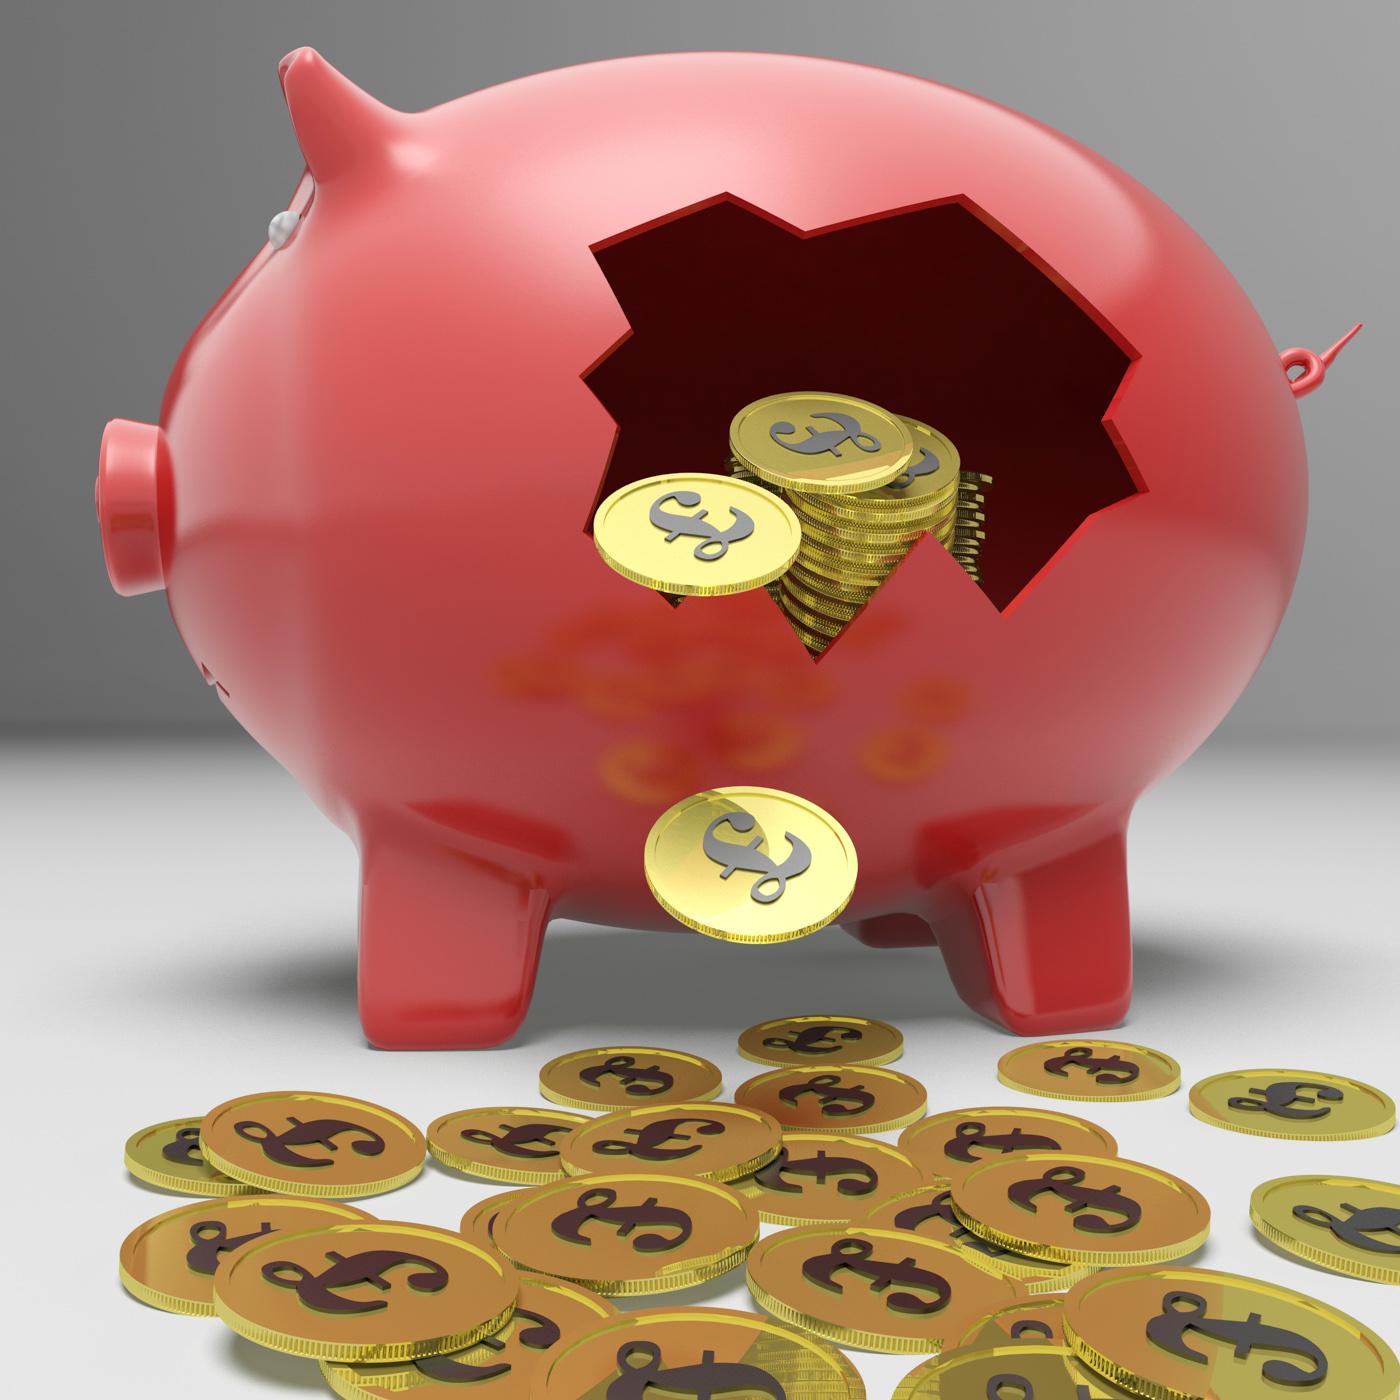 Broken Piggybank Shows Britain Bank Deposits, Financial, Savings, Save, Profit, HQ Photo